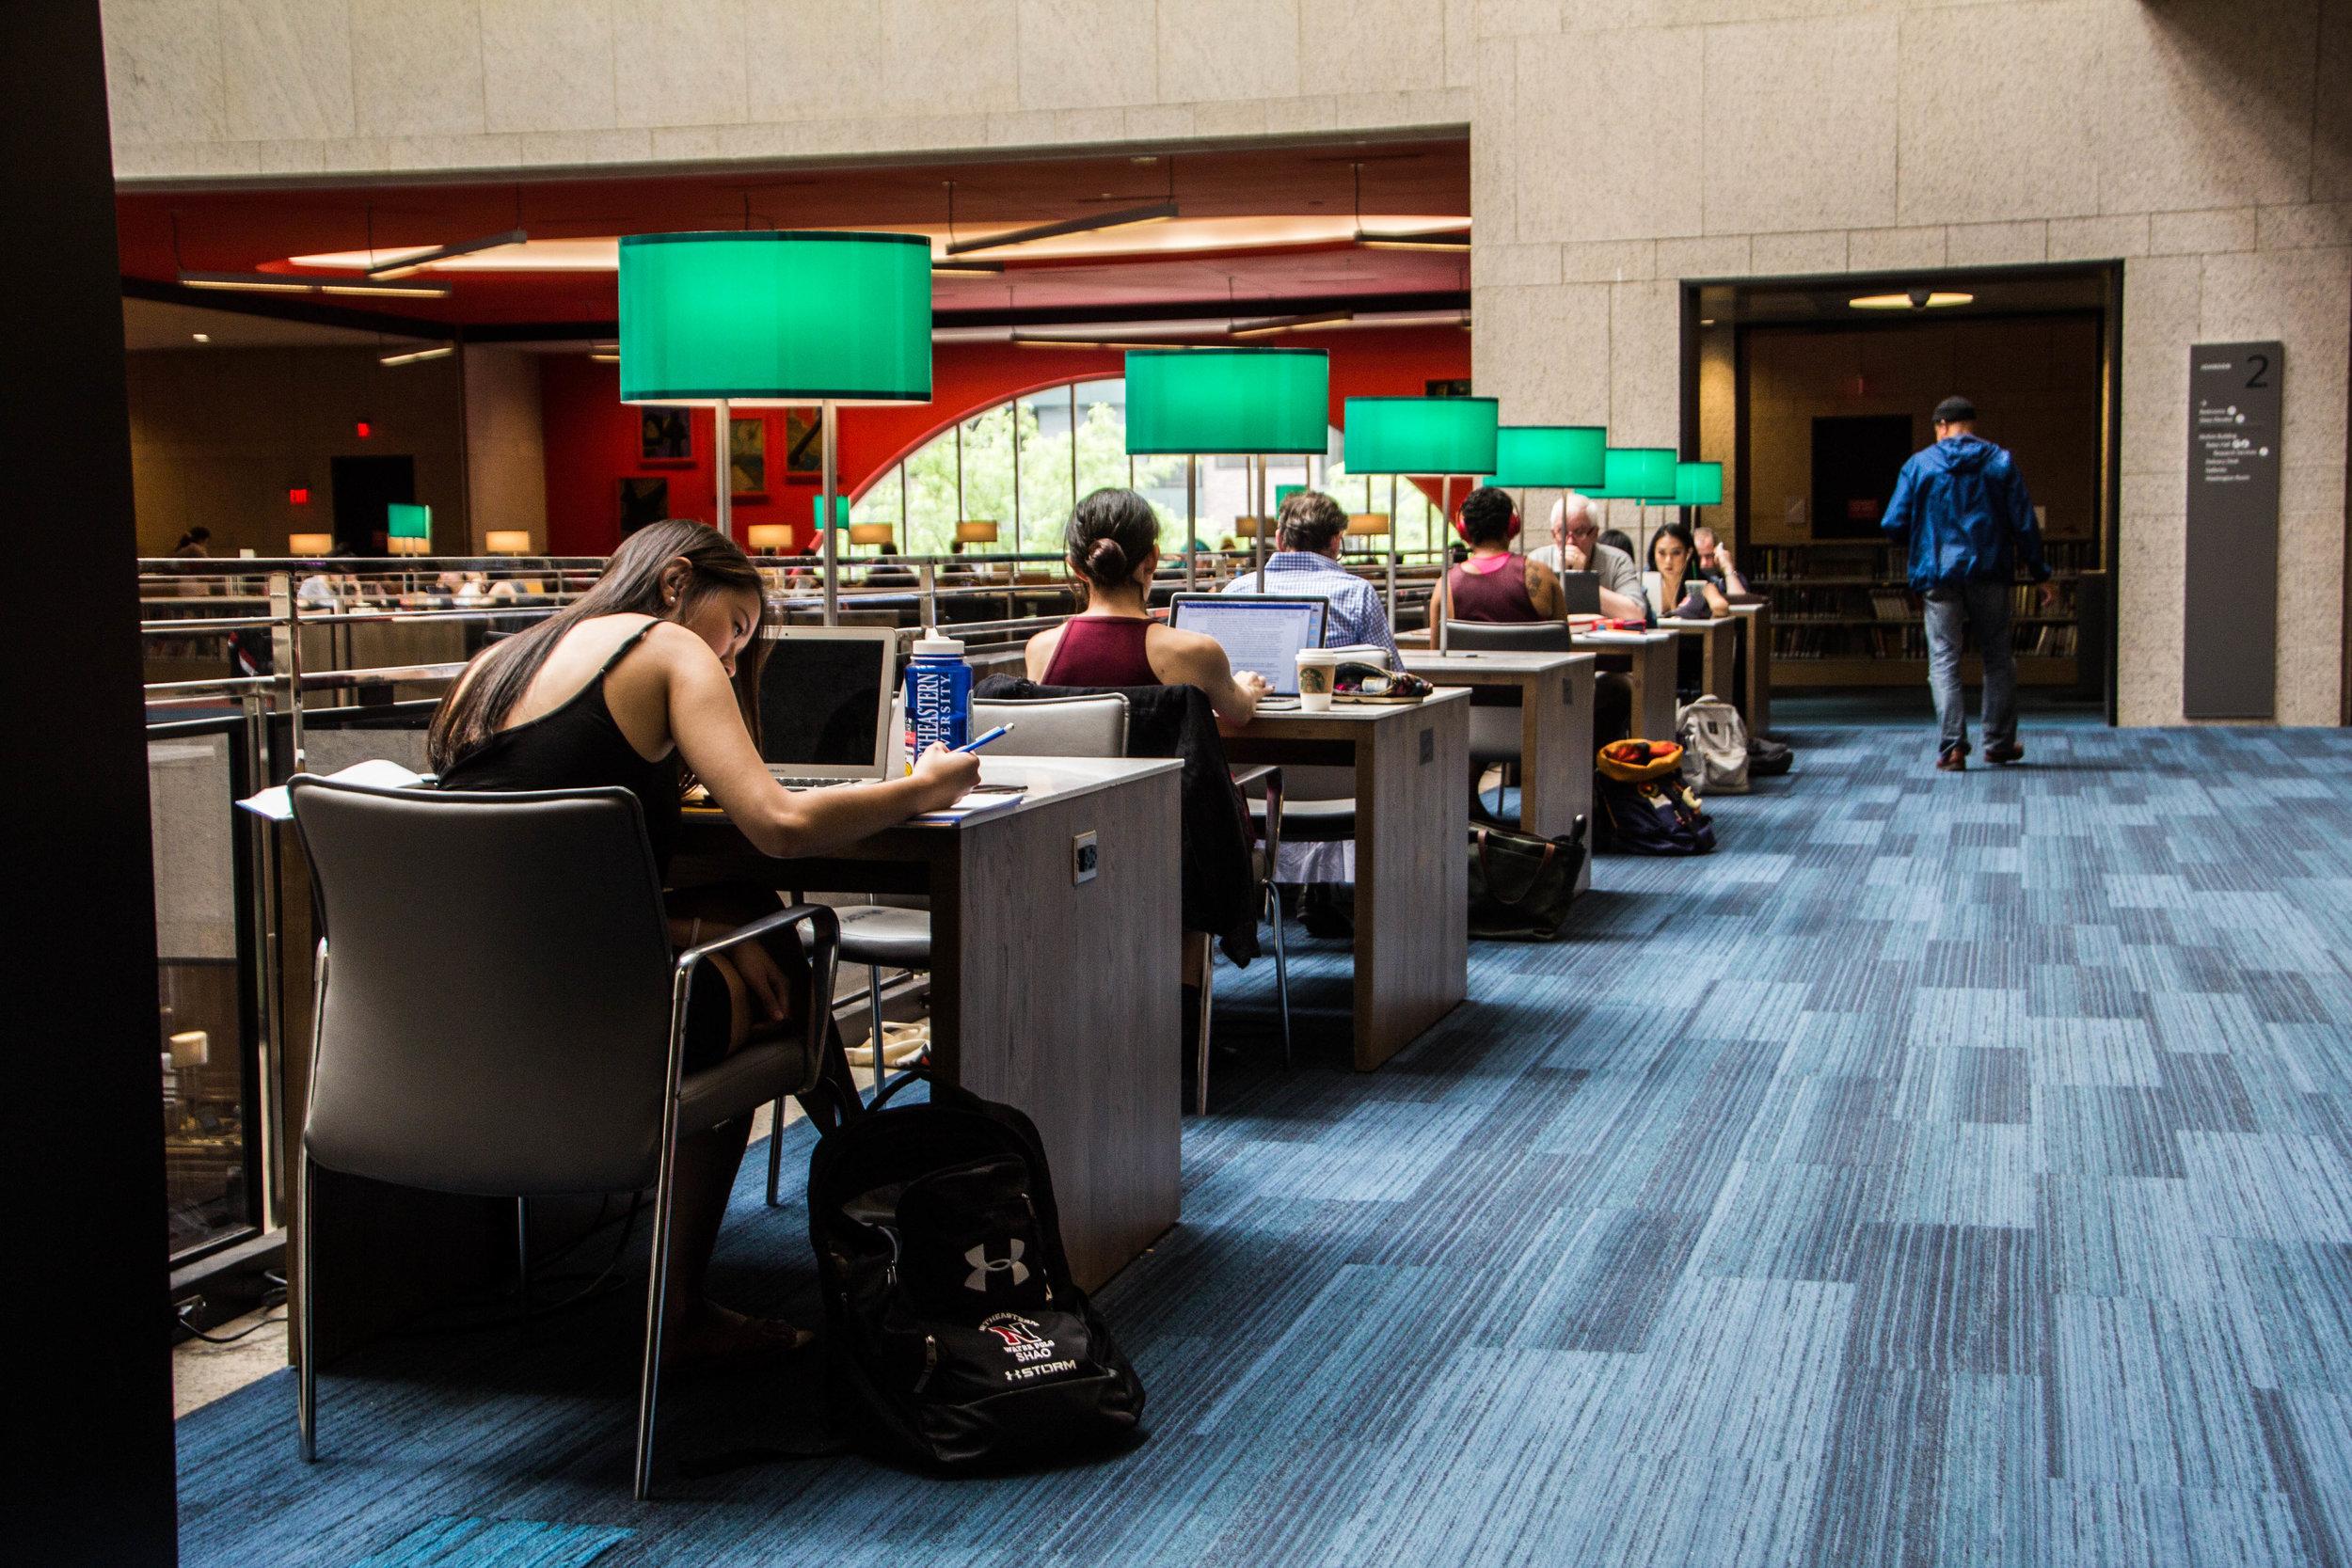 boston-public-library-photography-11.jpg